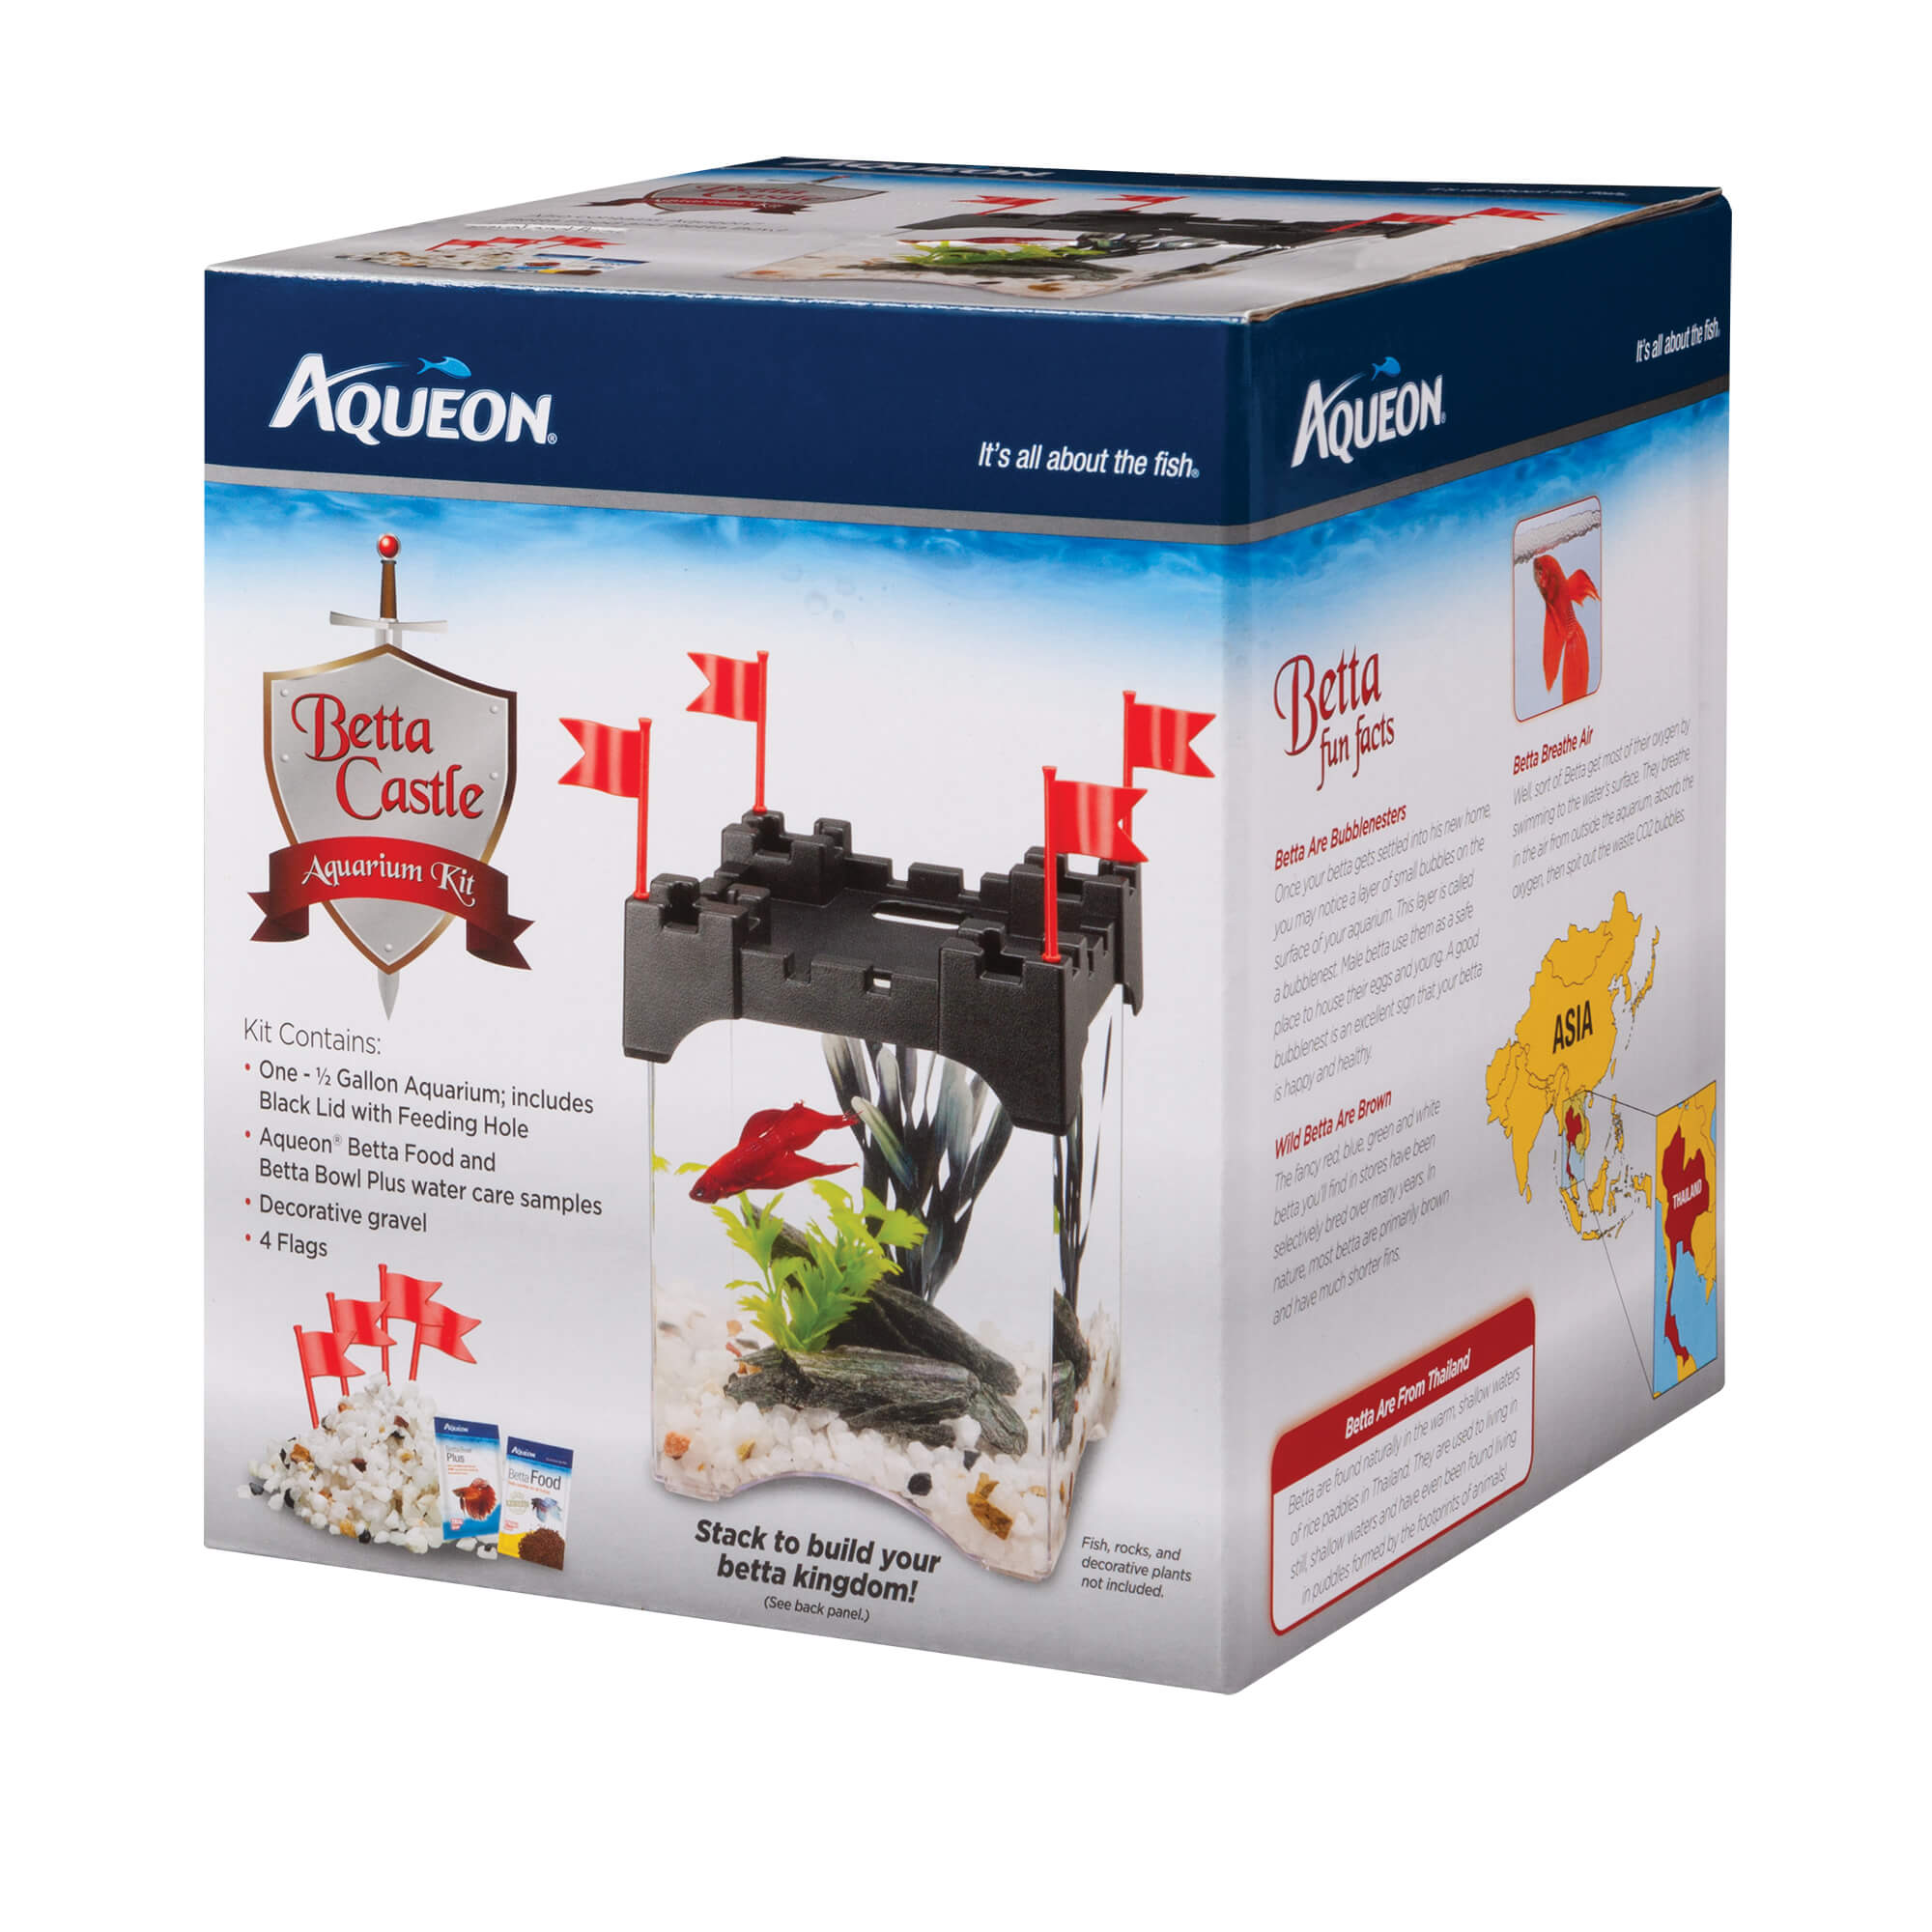 Aqueon Betta Castle Aquarium Kit, Black, 0.5-gallon